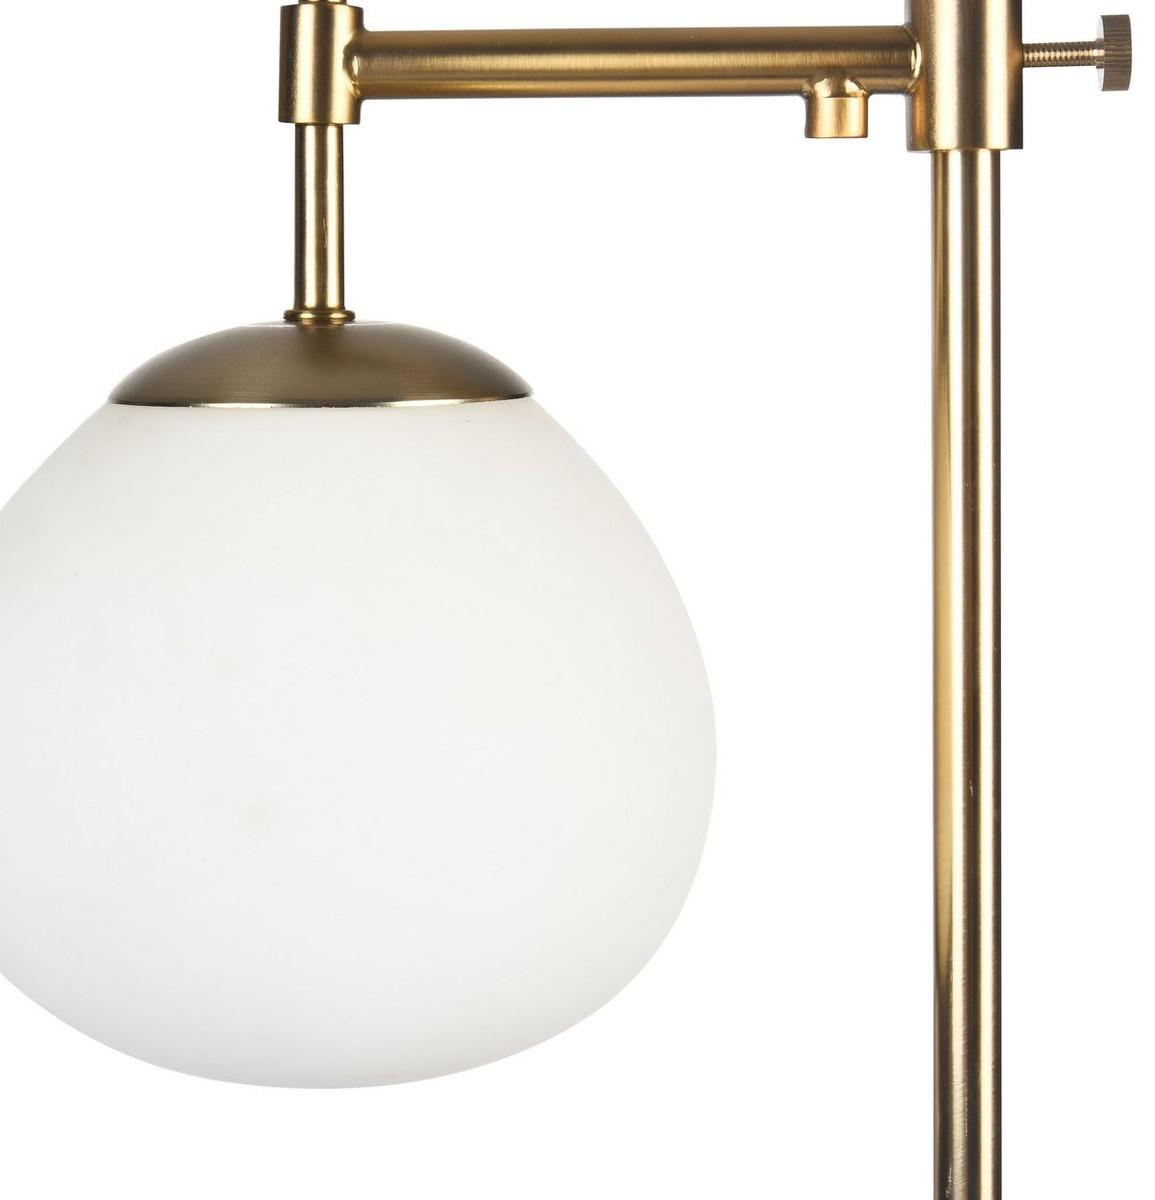 Full Size of Amazon Wohnzimmer Lampe Ikea Tischlampe Ebay Led Designer Tischlampen Modern Holz Dimmbar Casa Padrino Tischleuchte Gold 17 H 65 Cm Gardinen Für Moderne Wohnzimmer Wohnzimmer Tischlampe